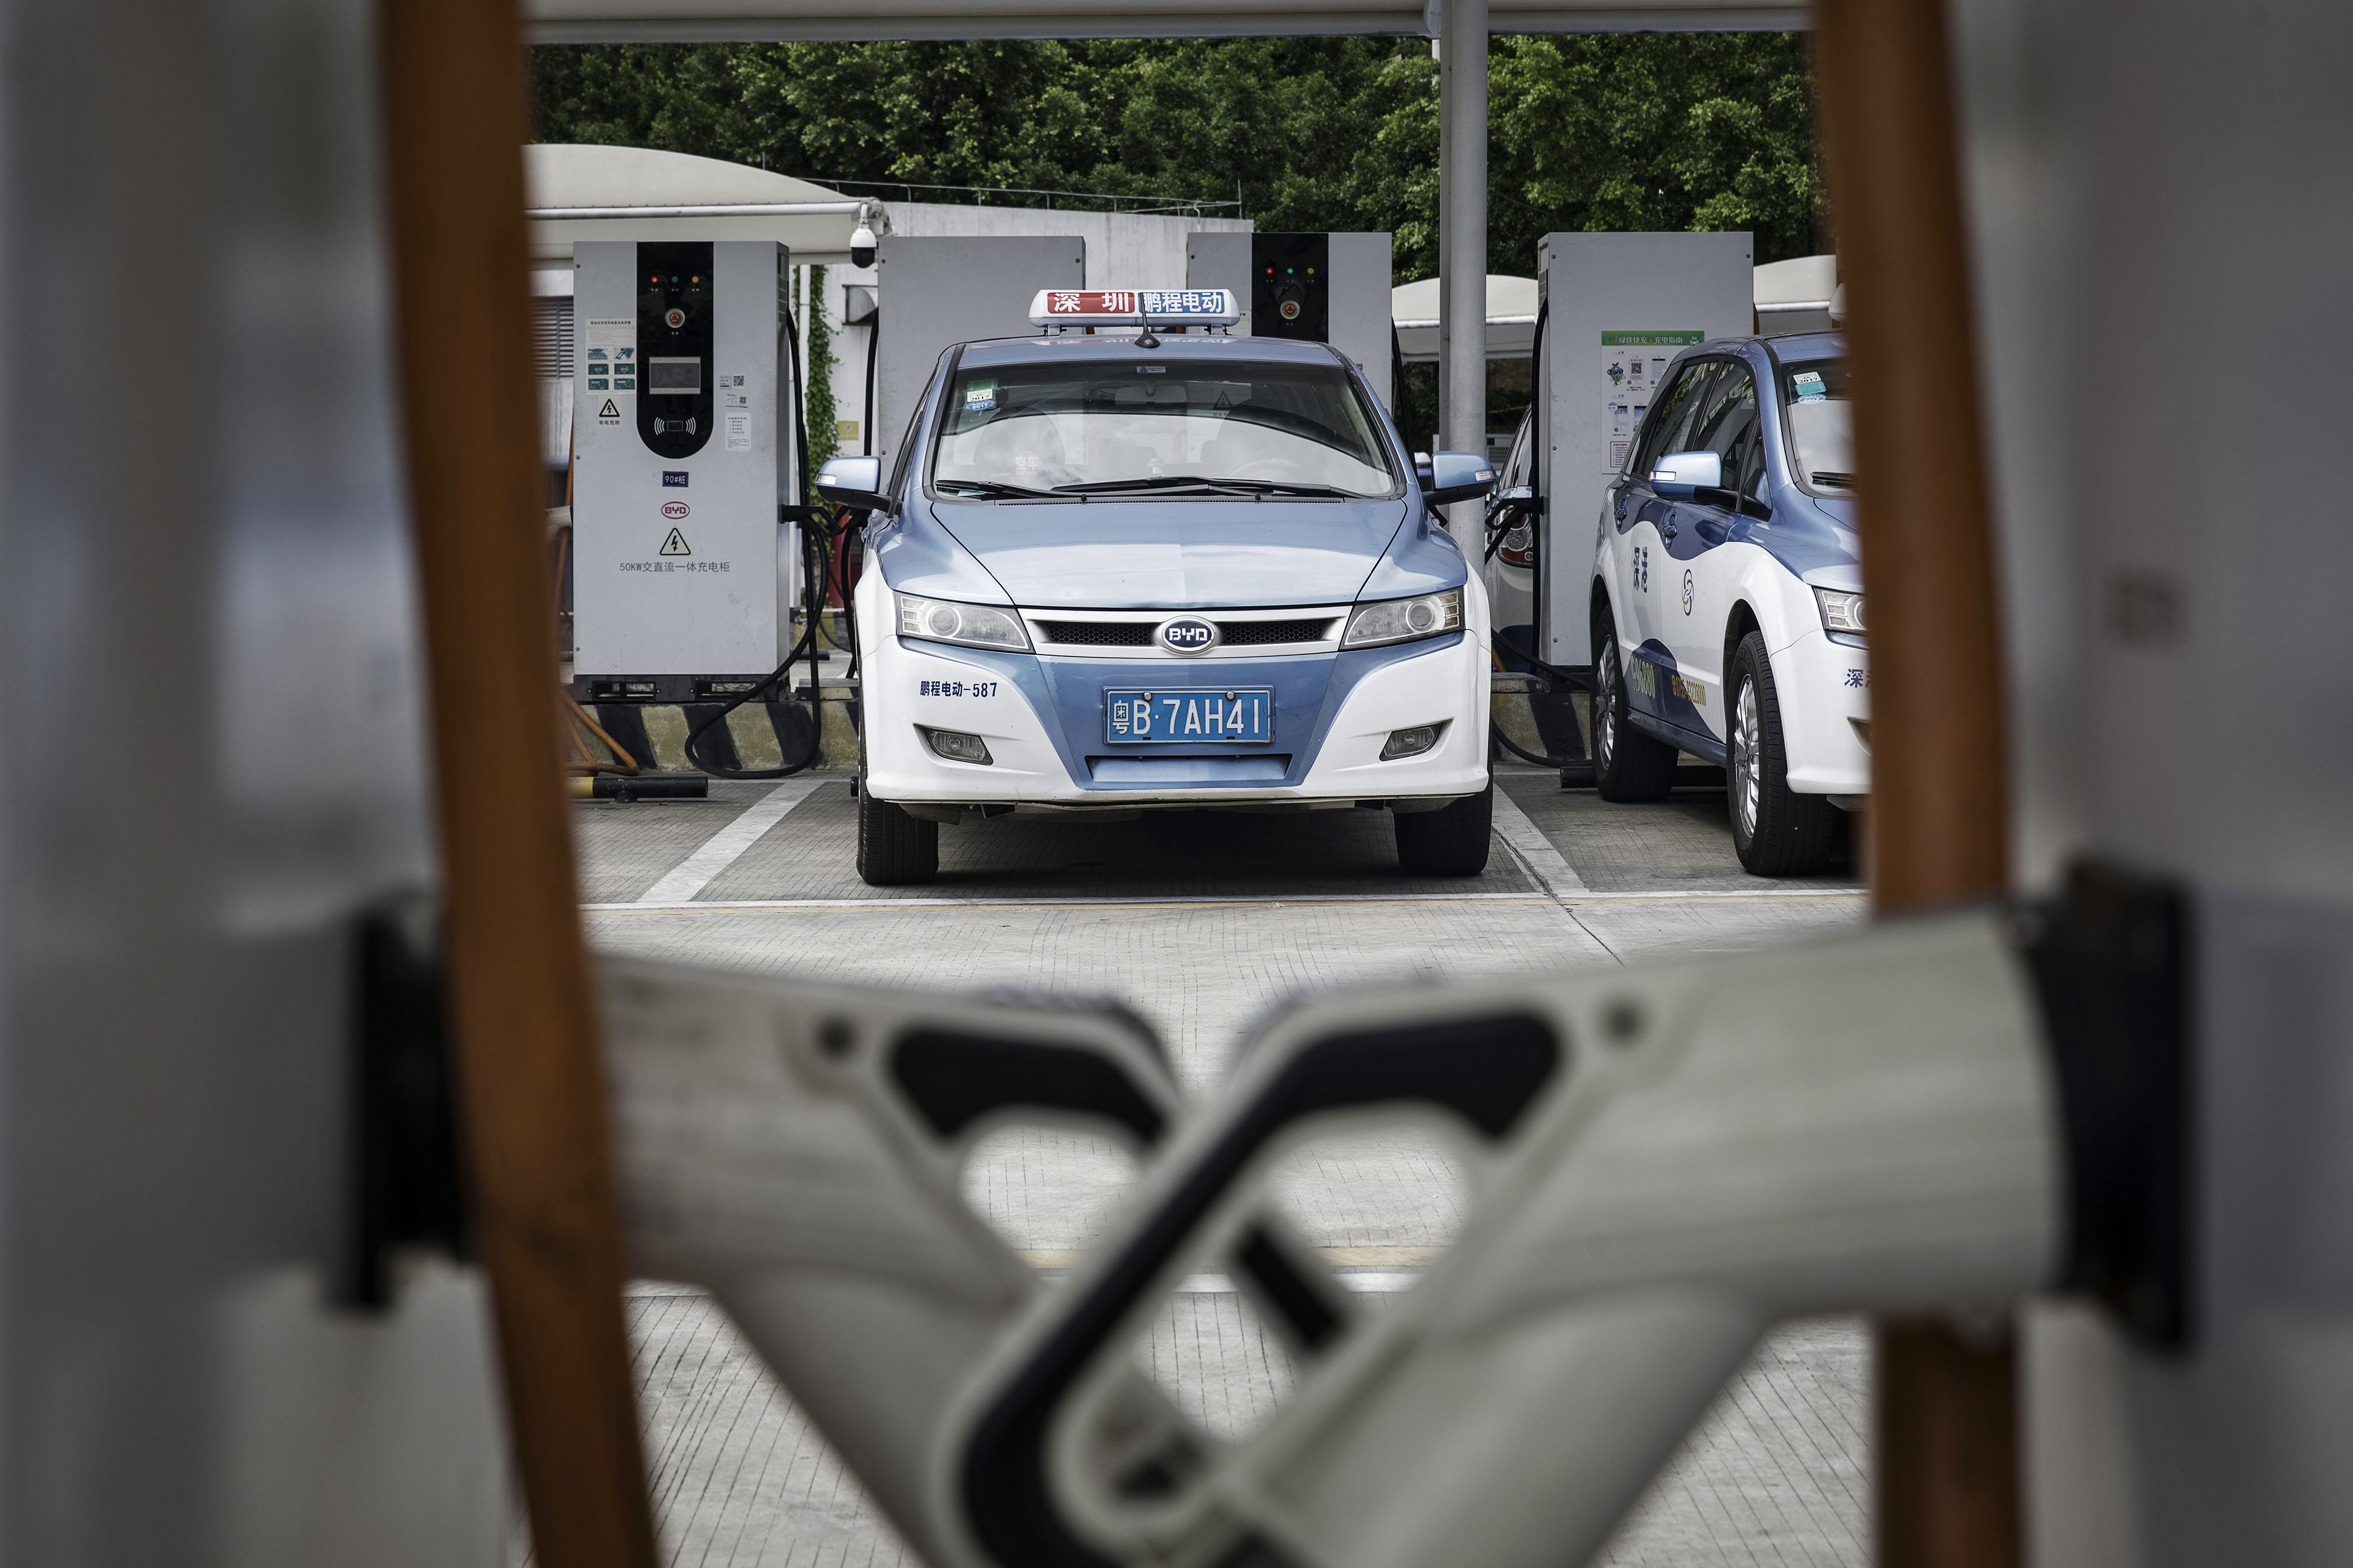 China Raises Subsidies To Reward Longer Range Electric Cars Bloomberg Most Popular Car Ever Producedquot